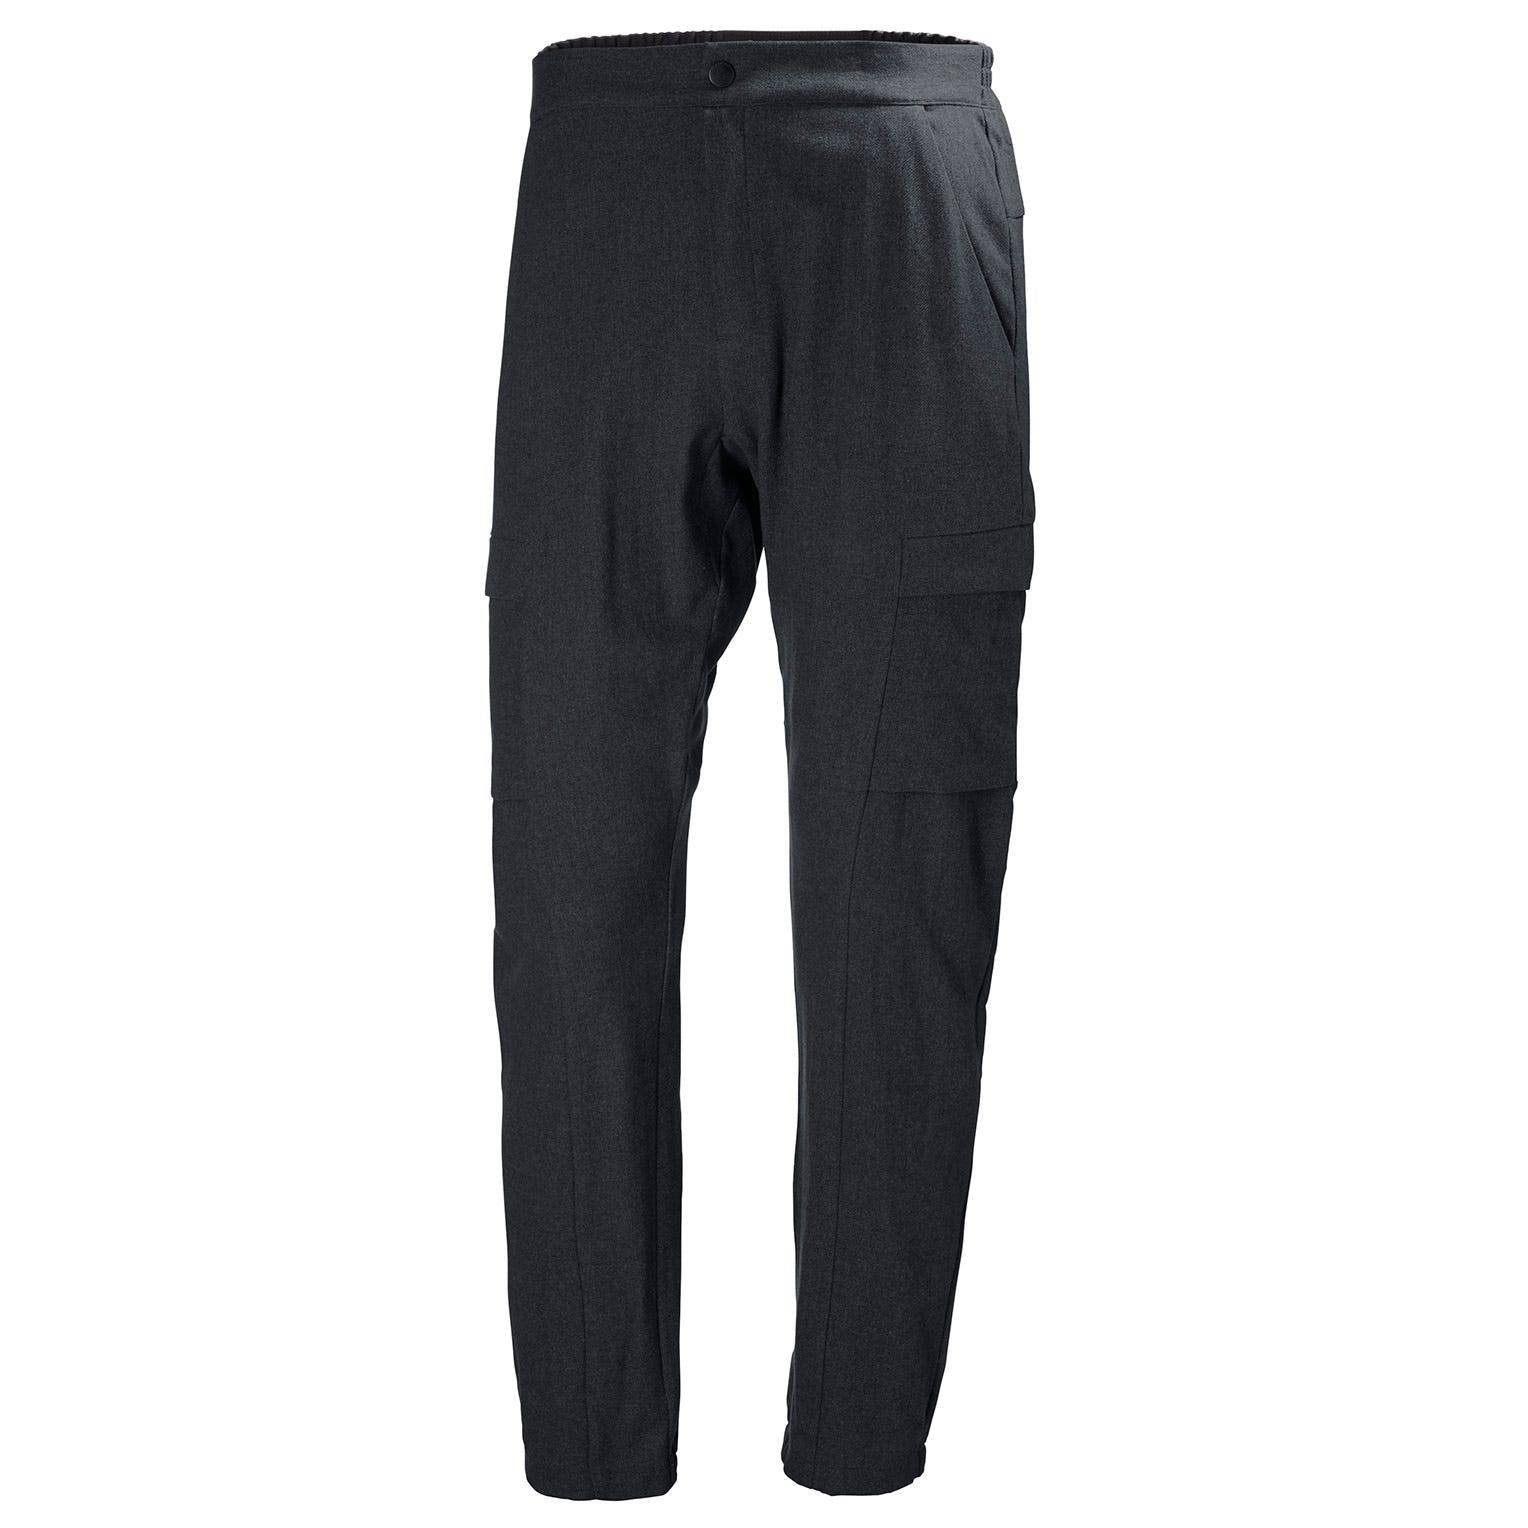 Helly Hansen Wool Travel Hiking Pant Black M